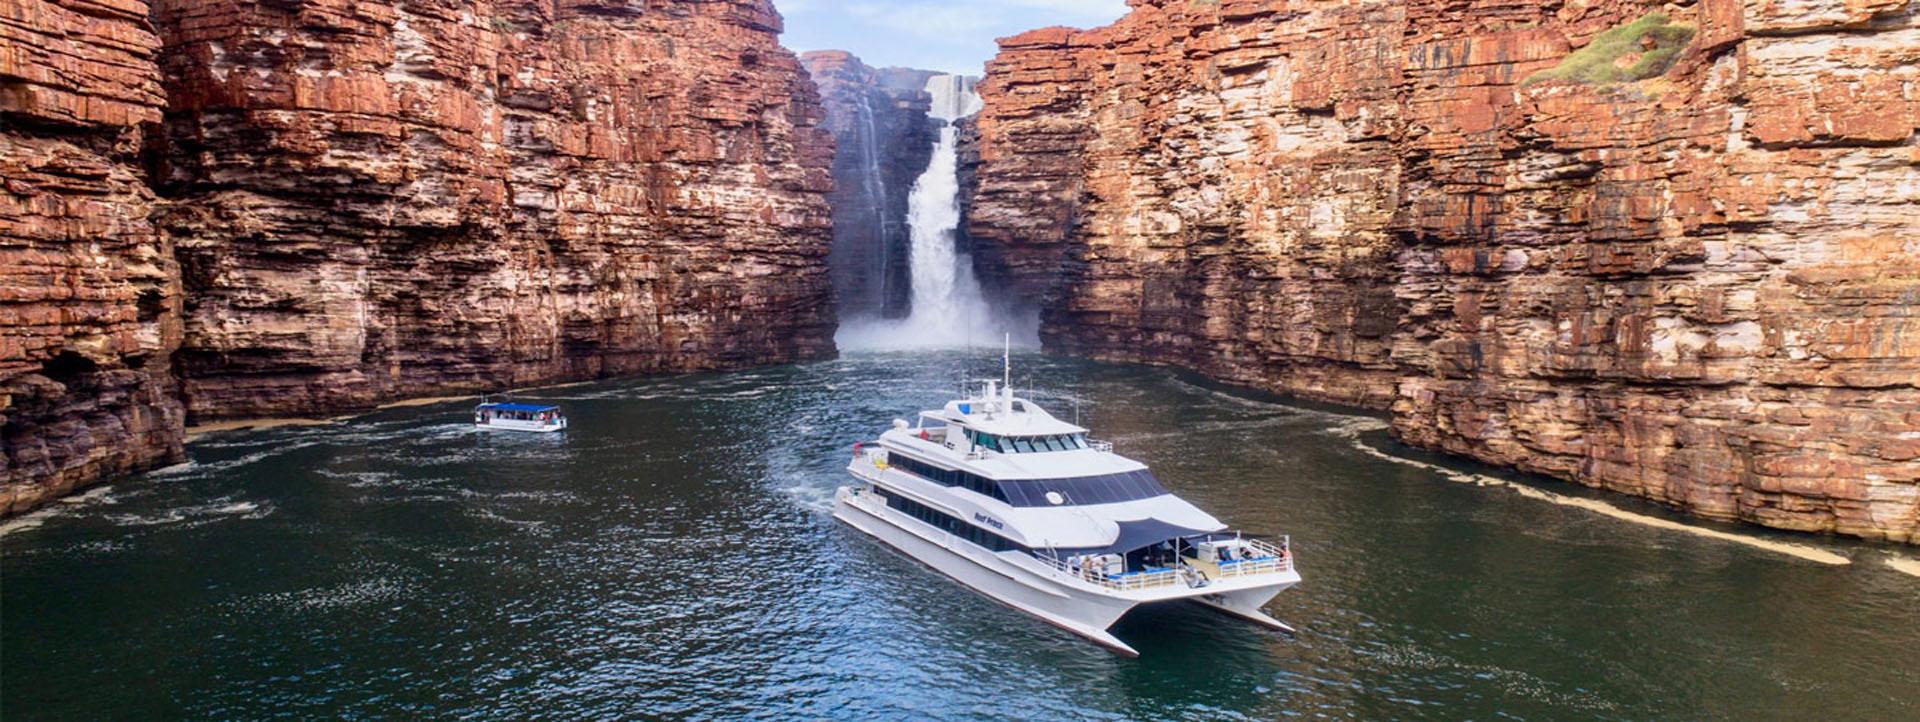 REEF PRINCE Kimberley cruises King George Falls